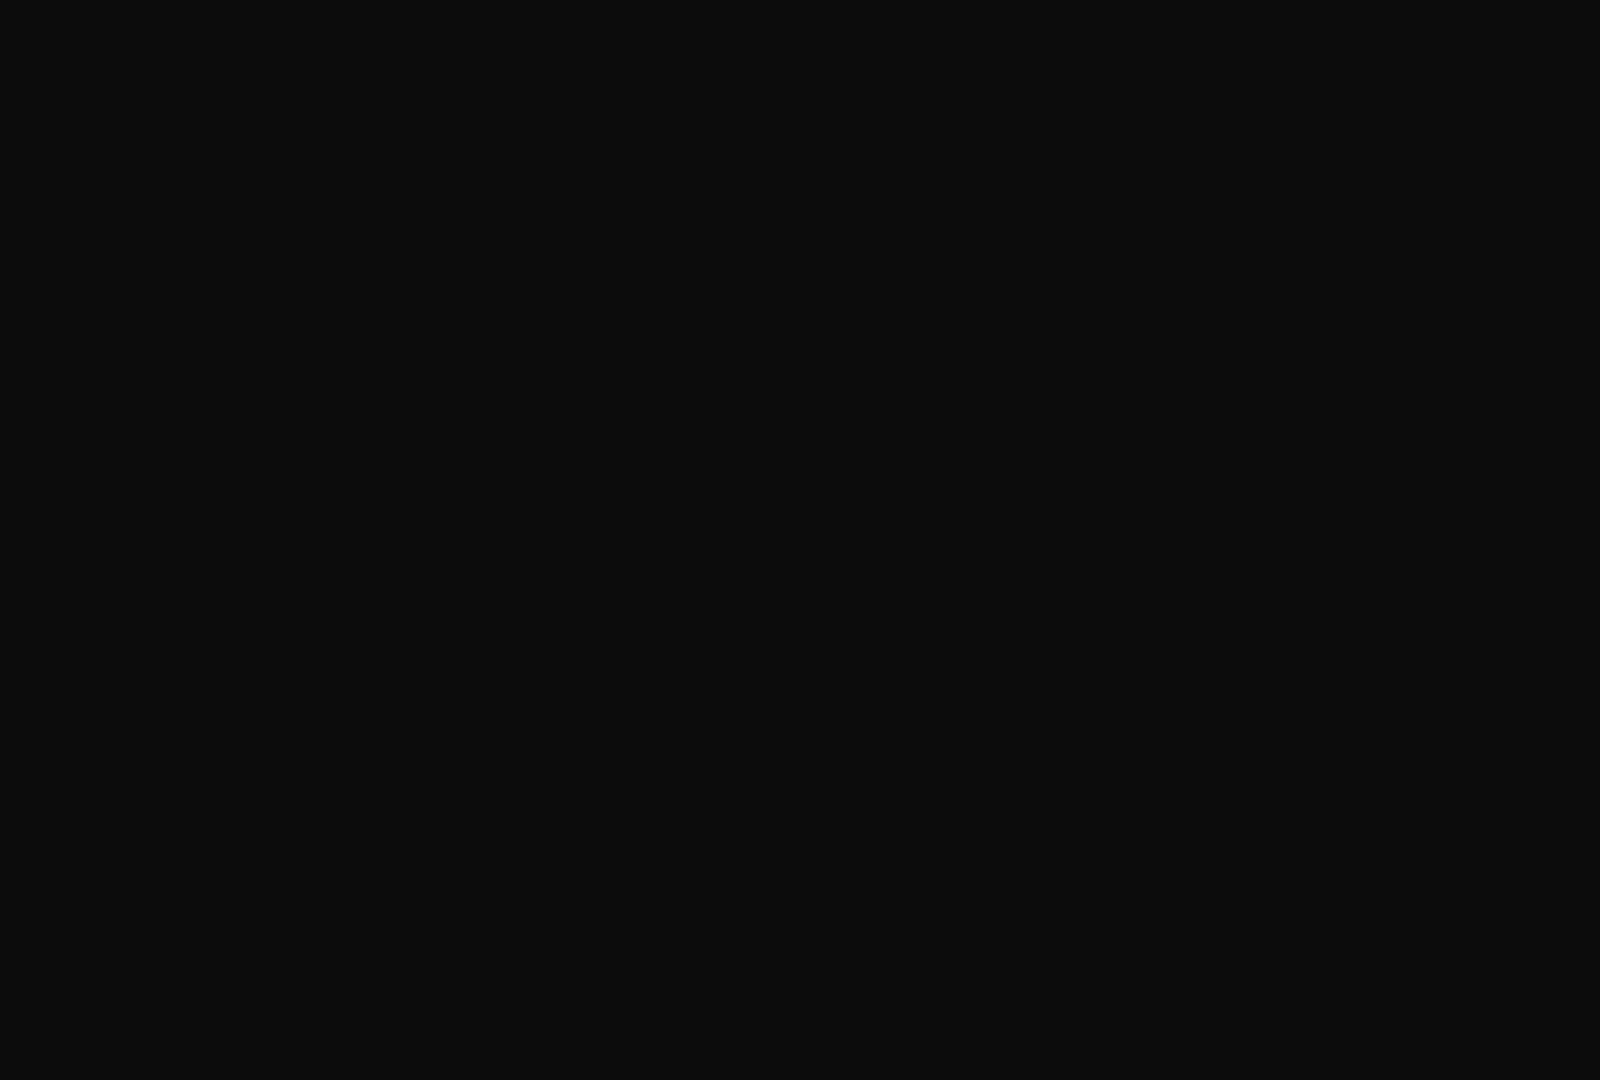 充血監督の深夜の運動会Vol.90 股間  110画像 20